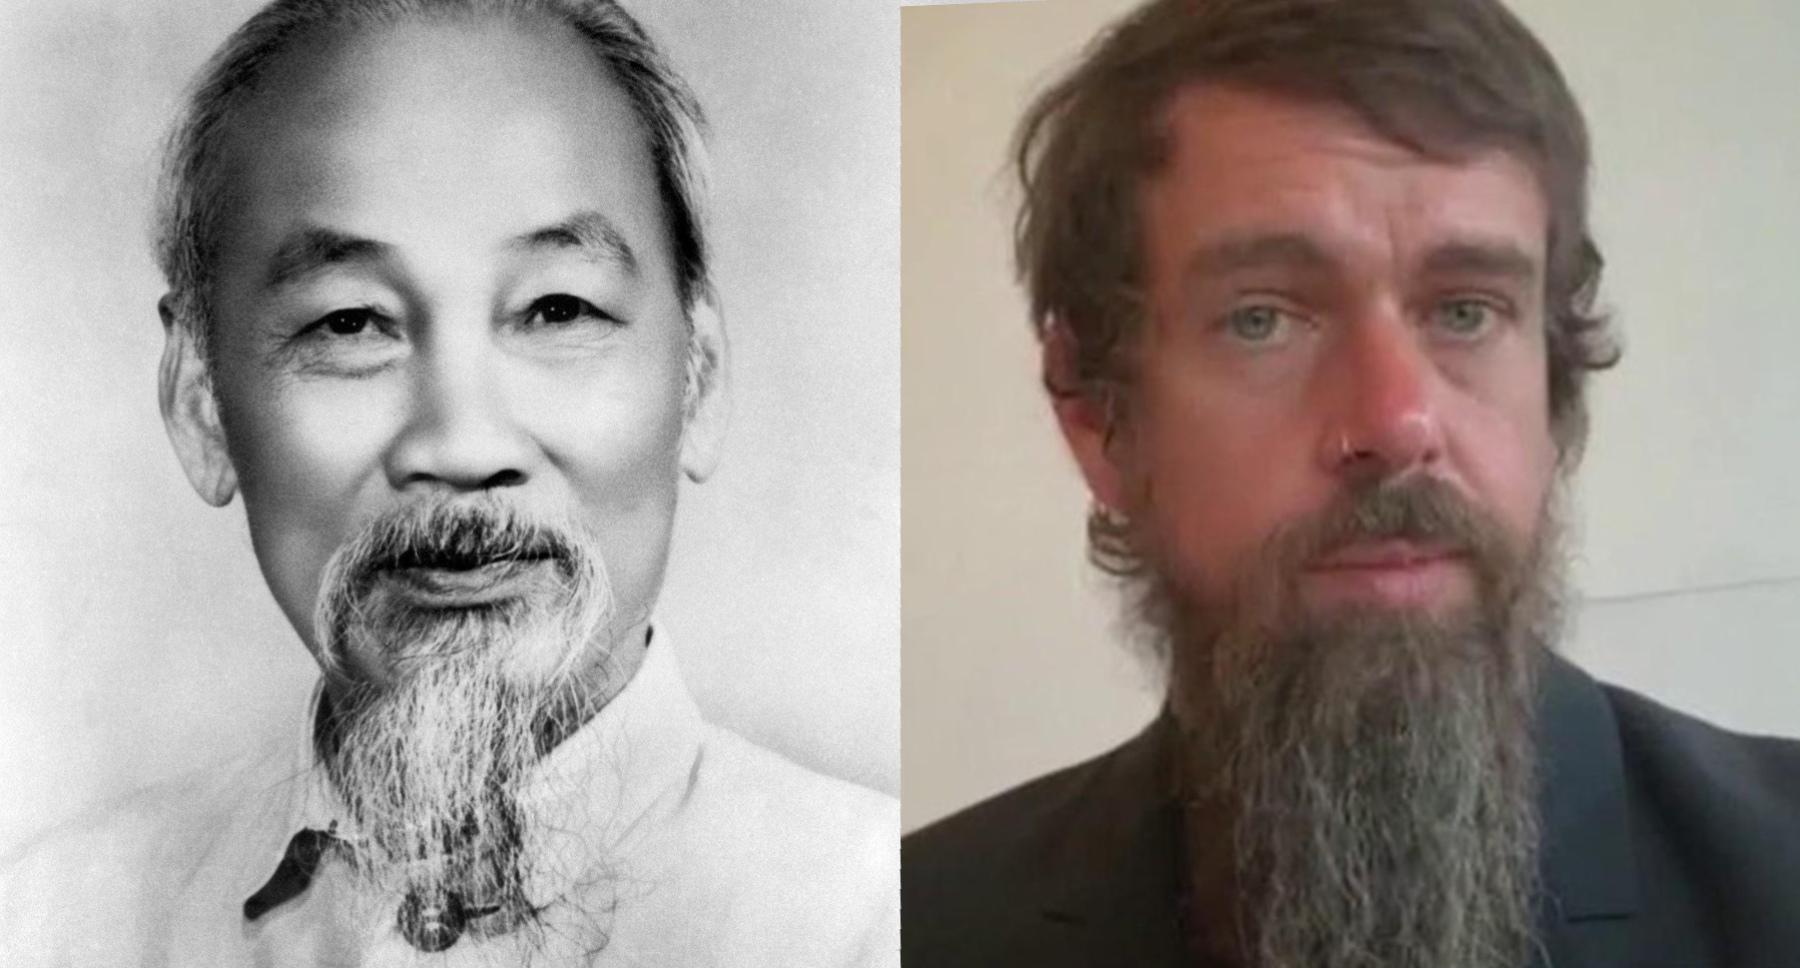 HO CHI MINH - JACK DORSEY